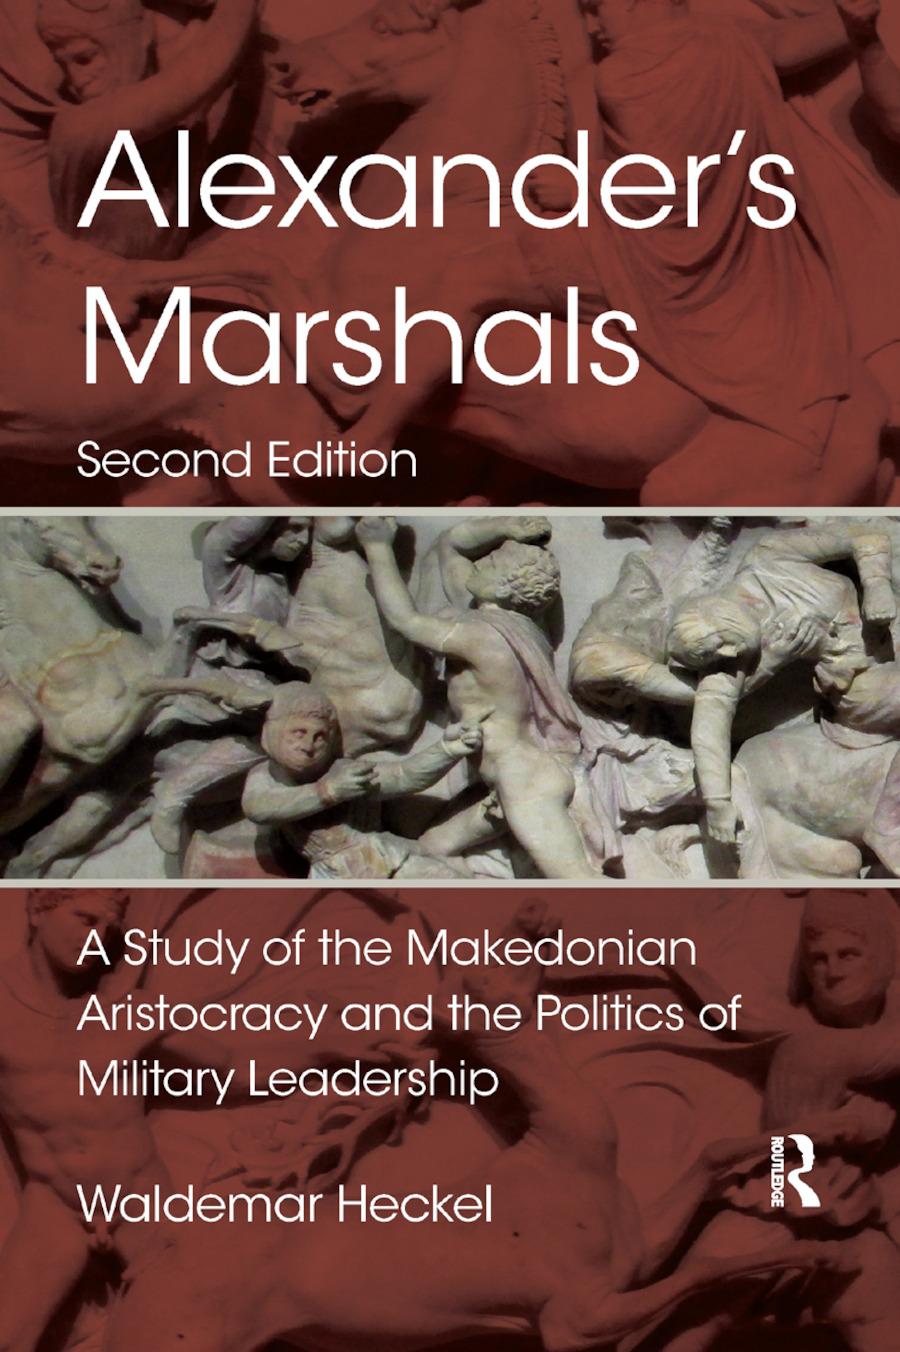 Alexander's Marshals